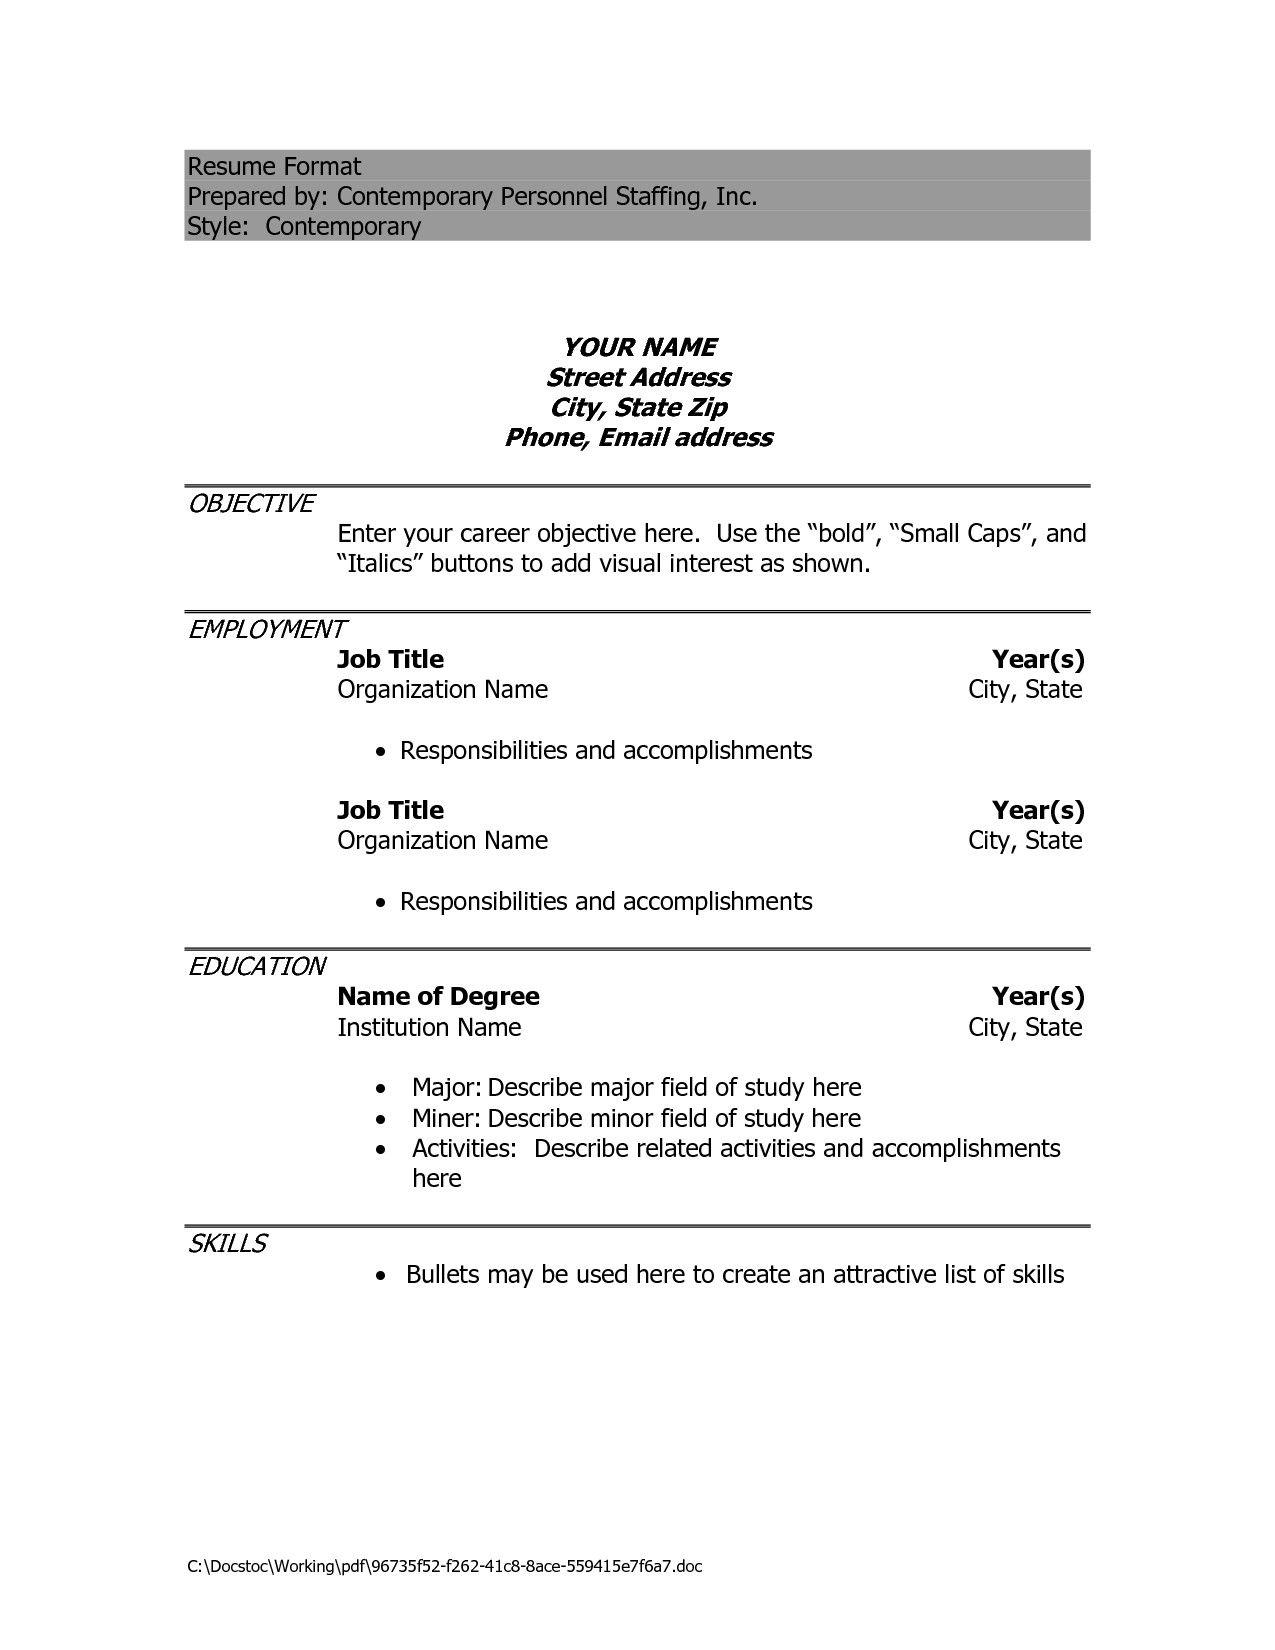 Free Resume Template Download Google Docs